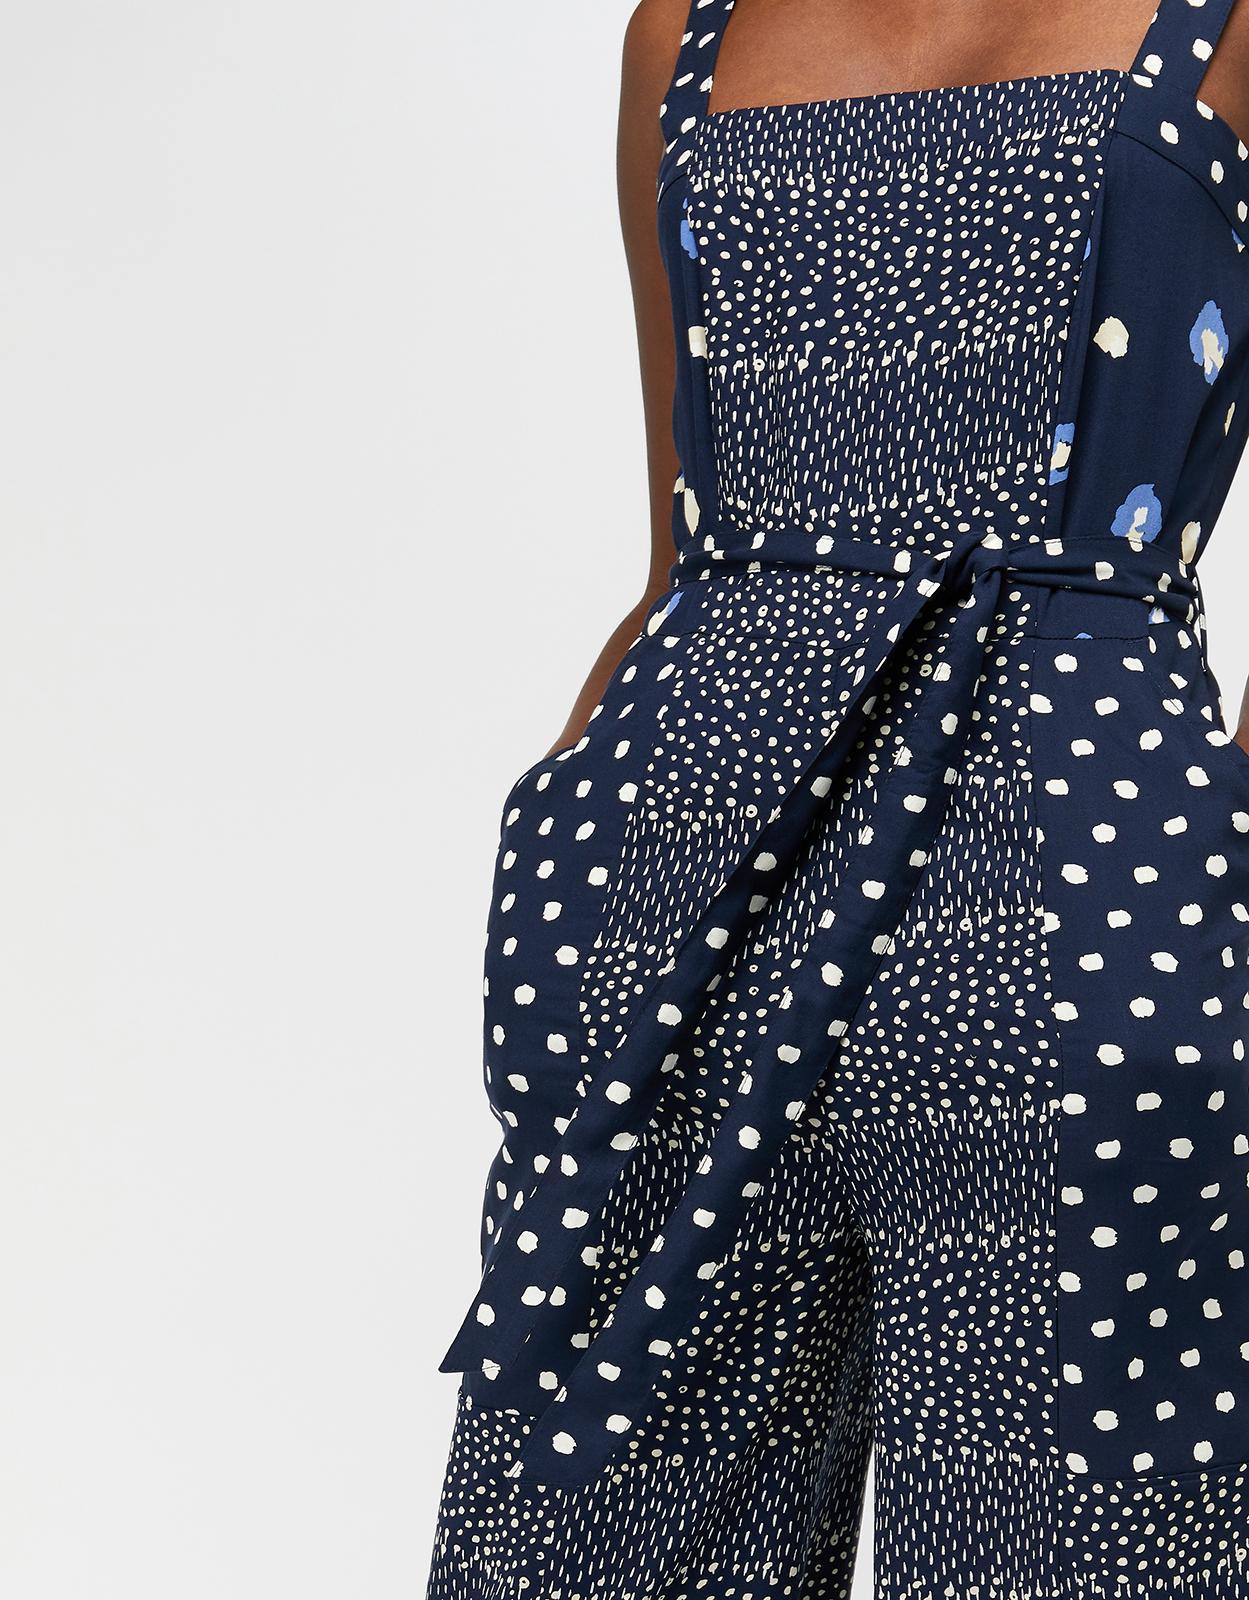 d04916cc3d ... Edie Print Crop Jumpsuit - Lyst. View fullscreen